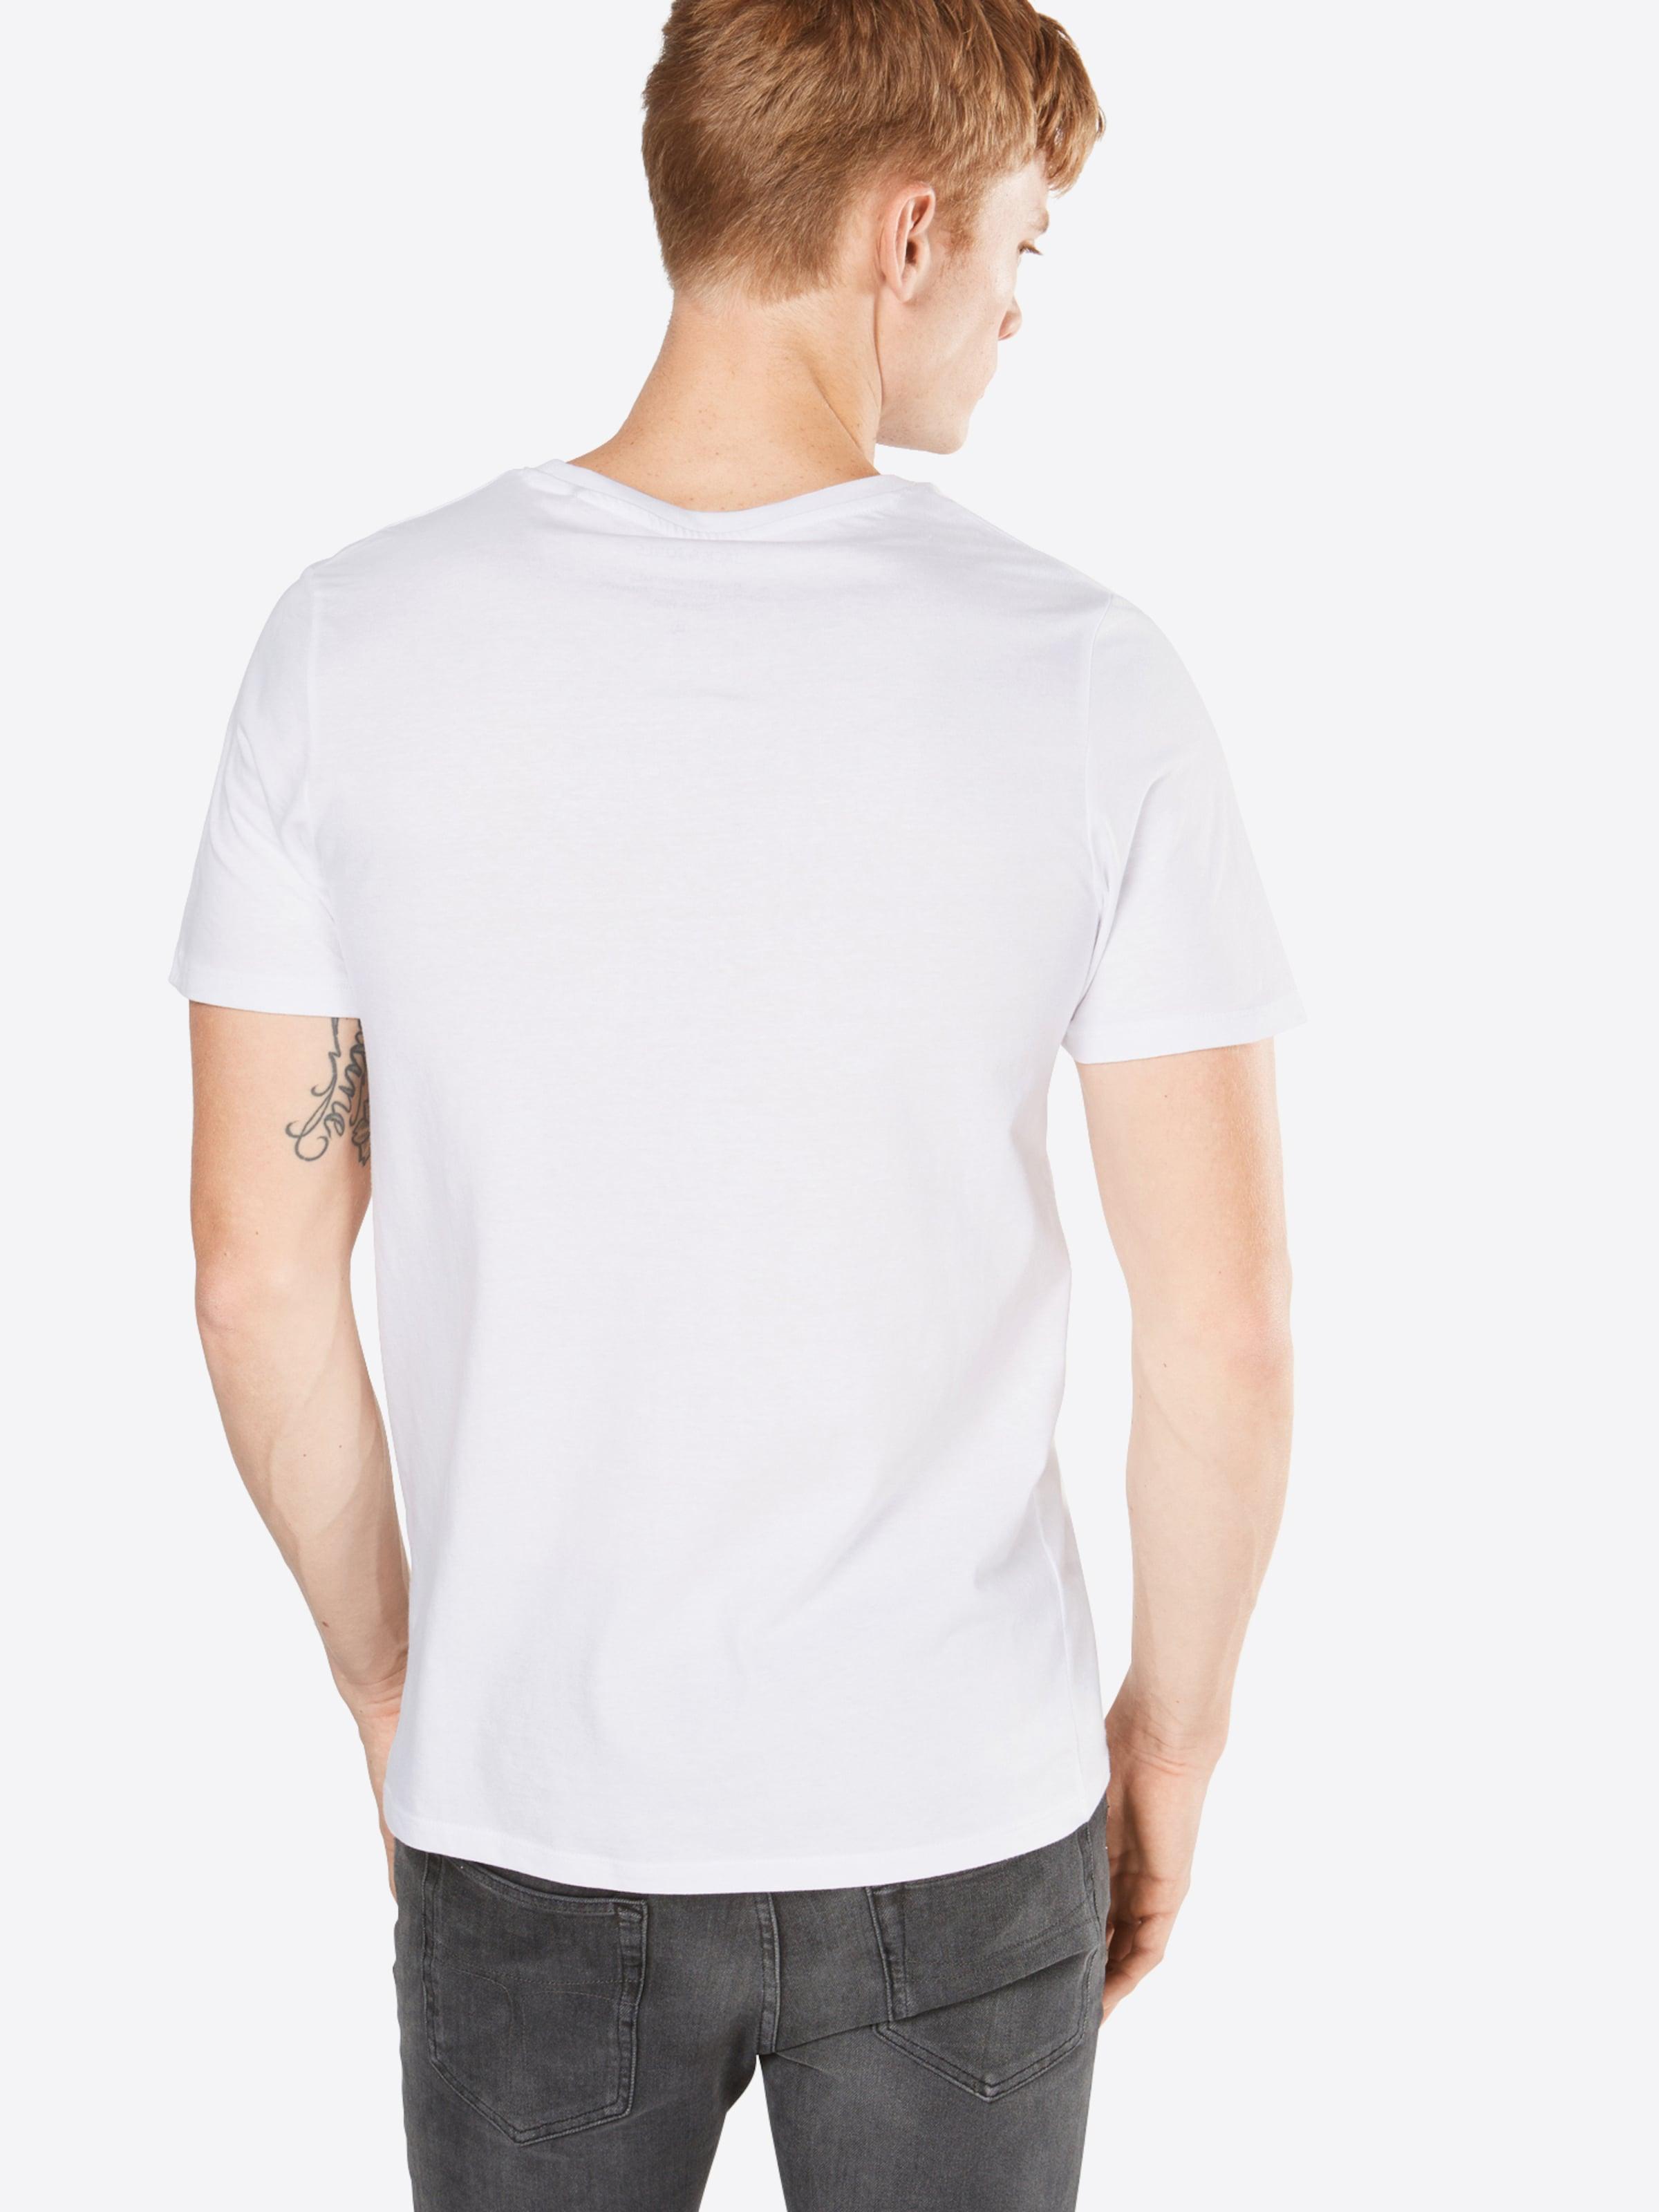 Neck' Ss Jones T Logo Tee RougeNoir shirt Jackamp; Crew 'jjecorp En Blanc 0wynOmvN8P